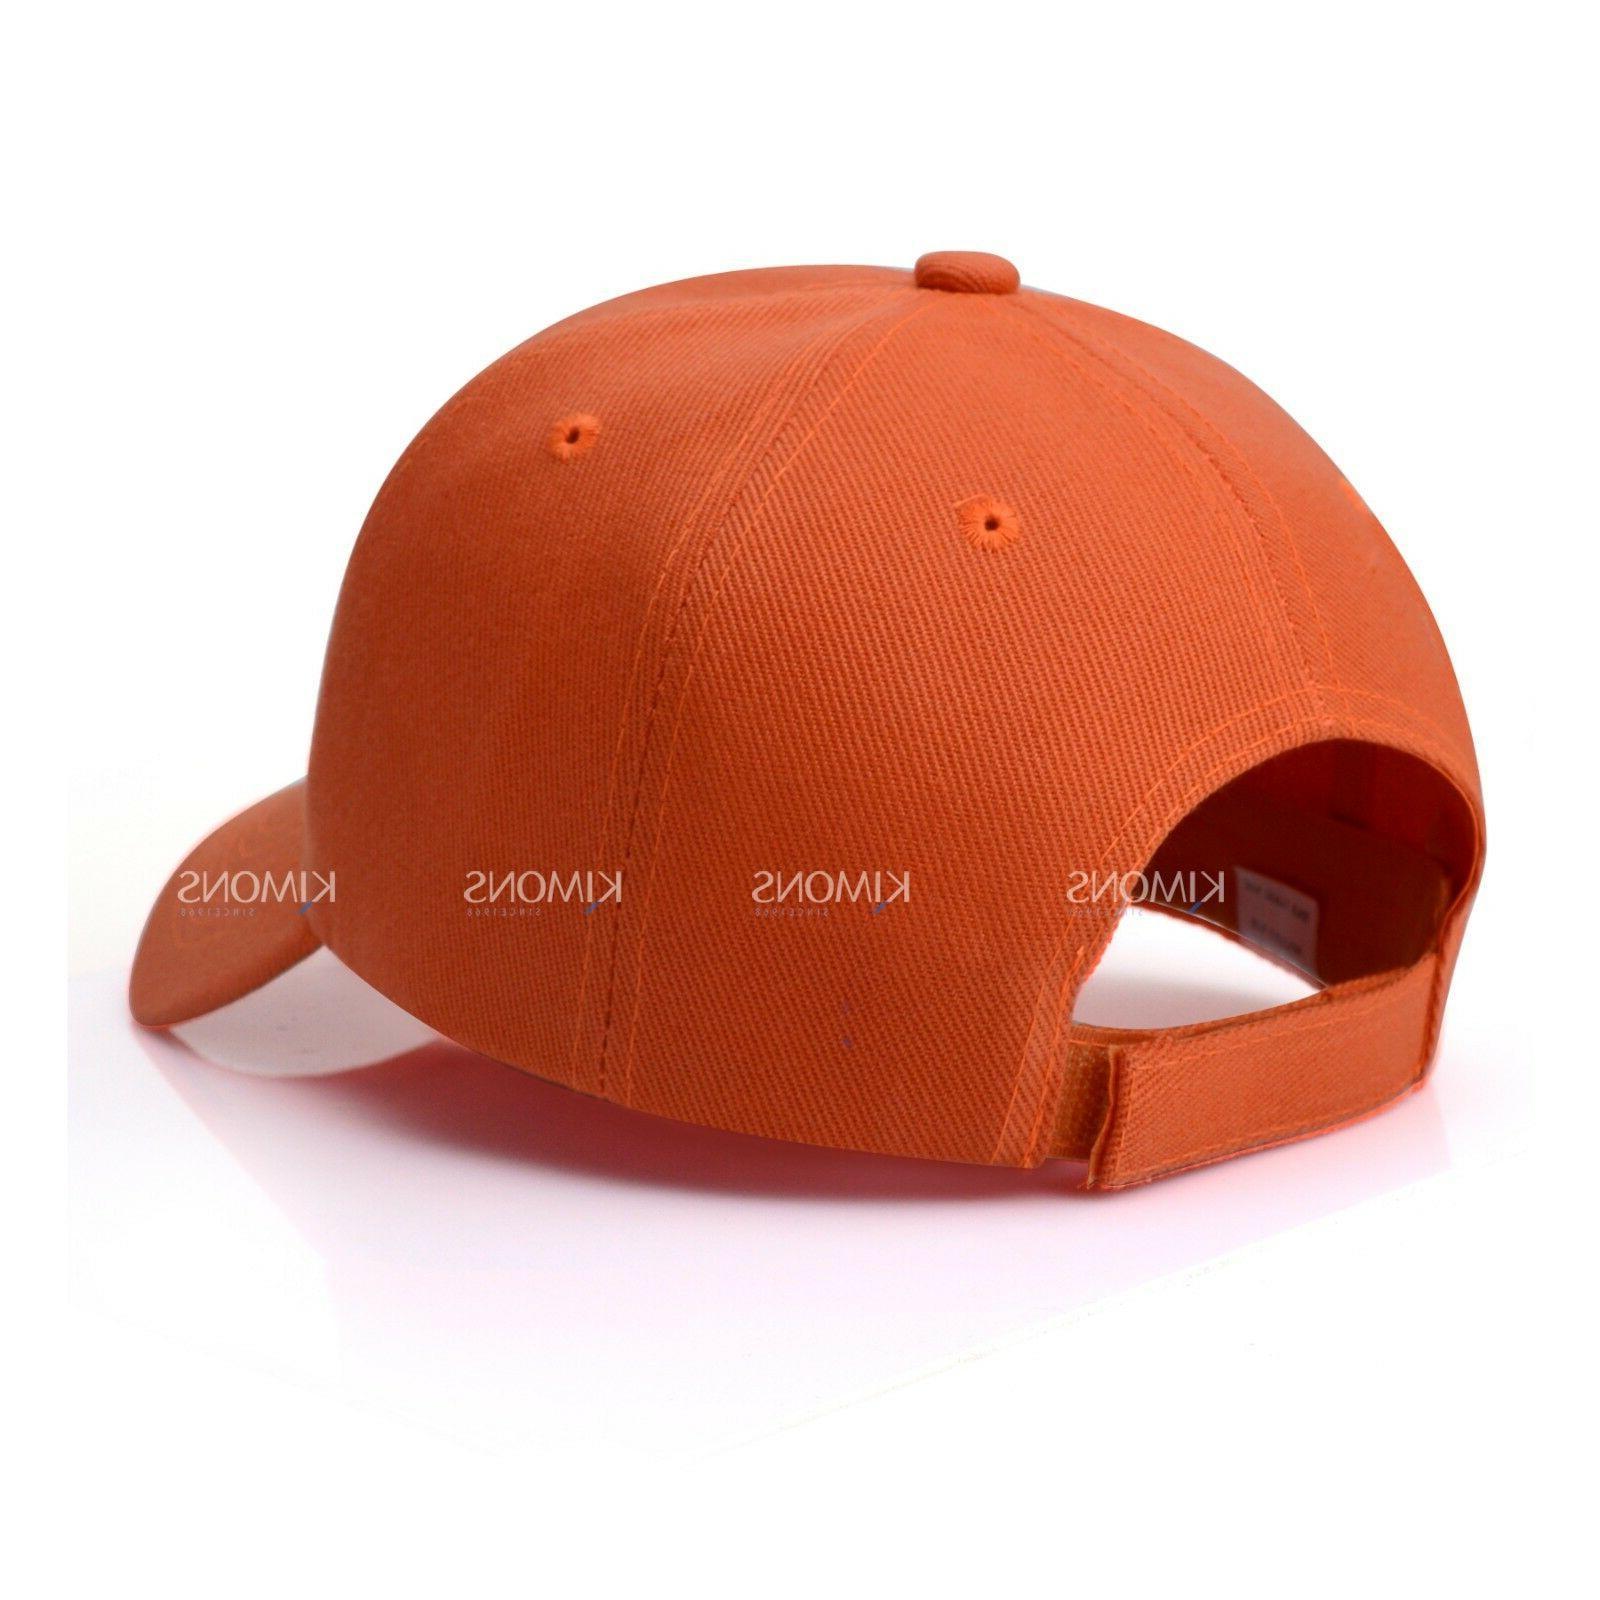 Loop Solid Color Curved Visor Hat Adjustable Army Mens